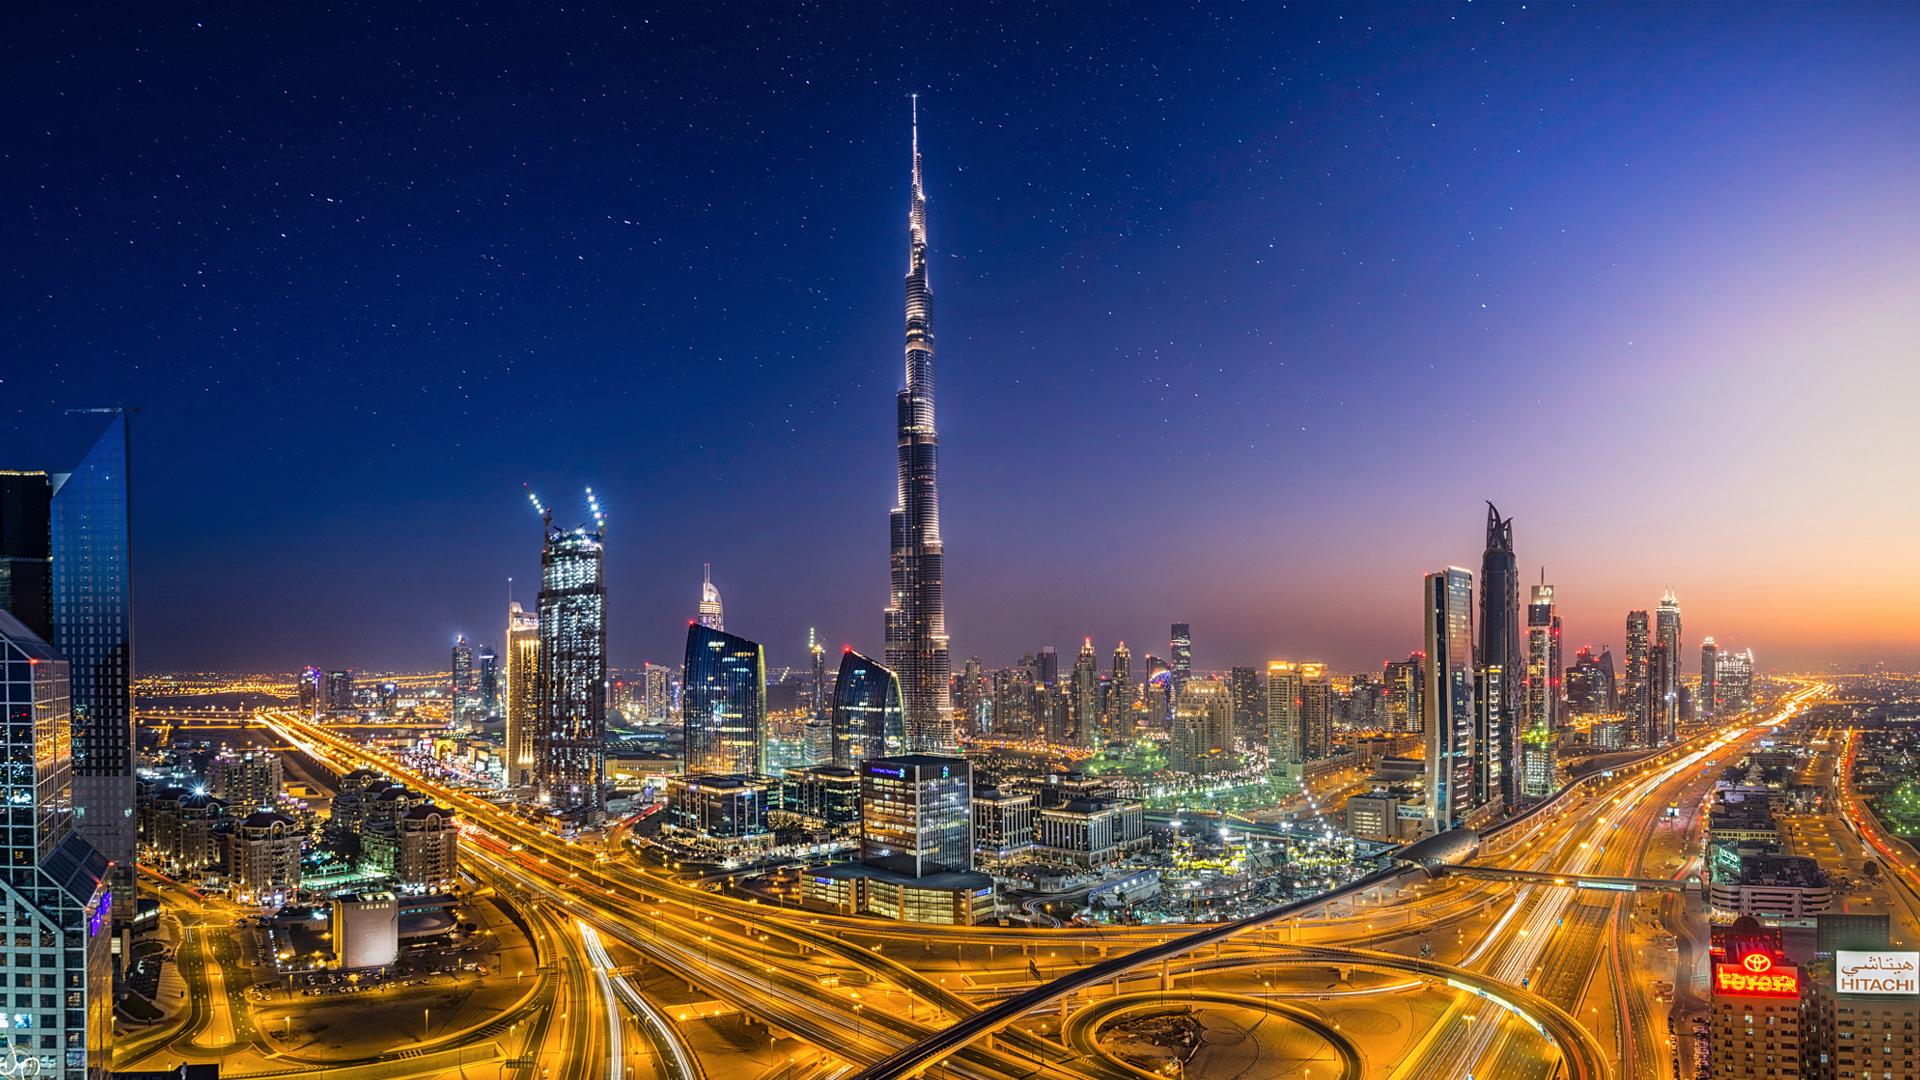 Dubai HD Wallpaper Background Image 1920x1080 ID599397 1920x1080